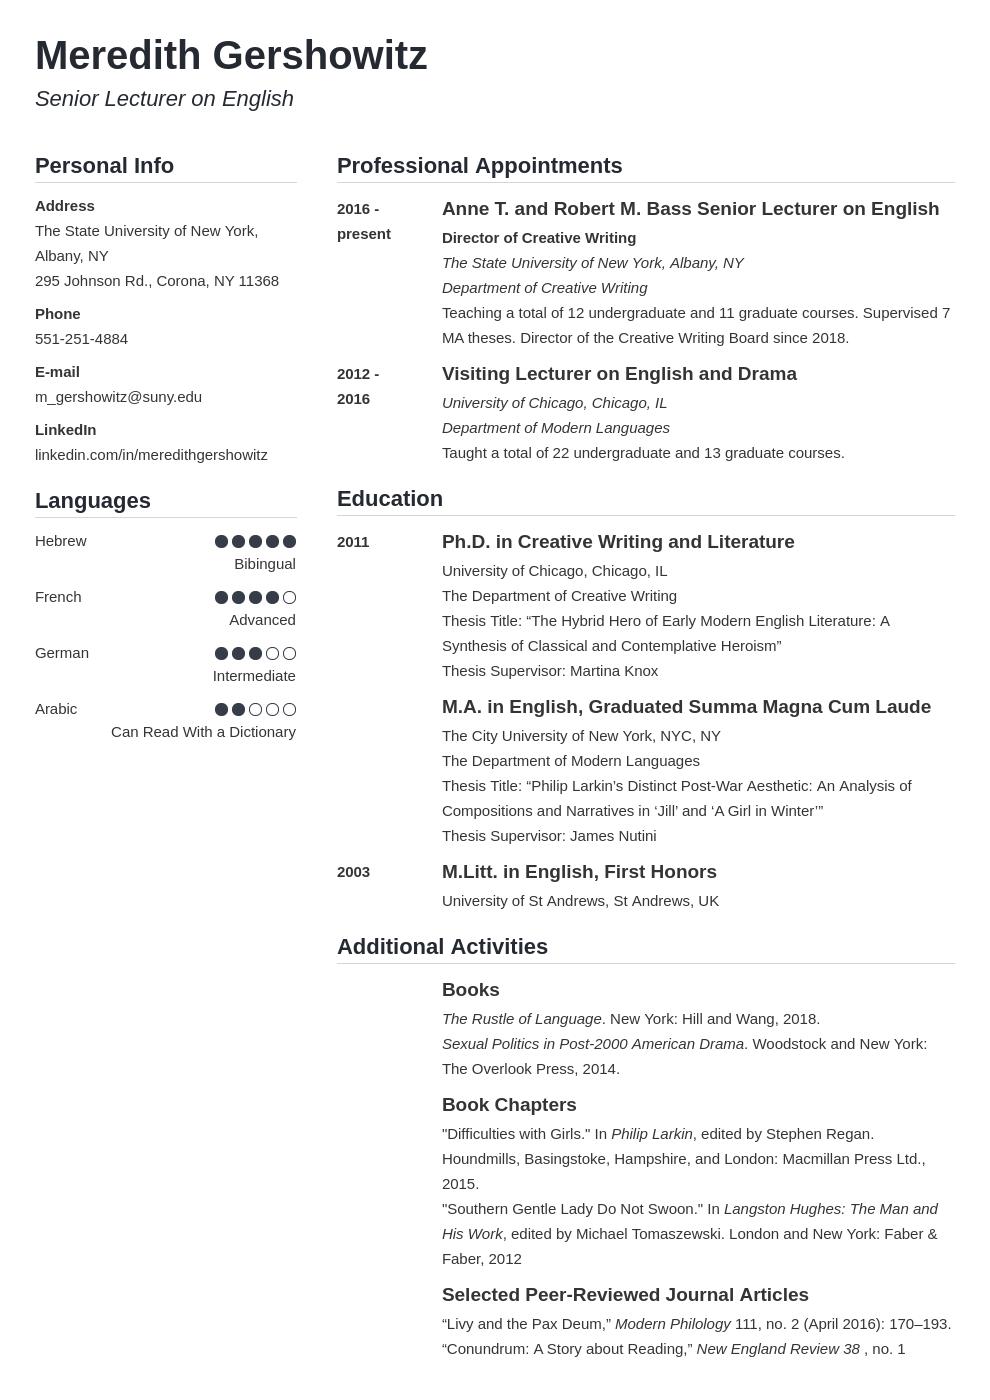 cv academic template simple uk